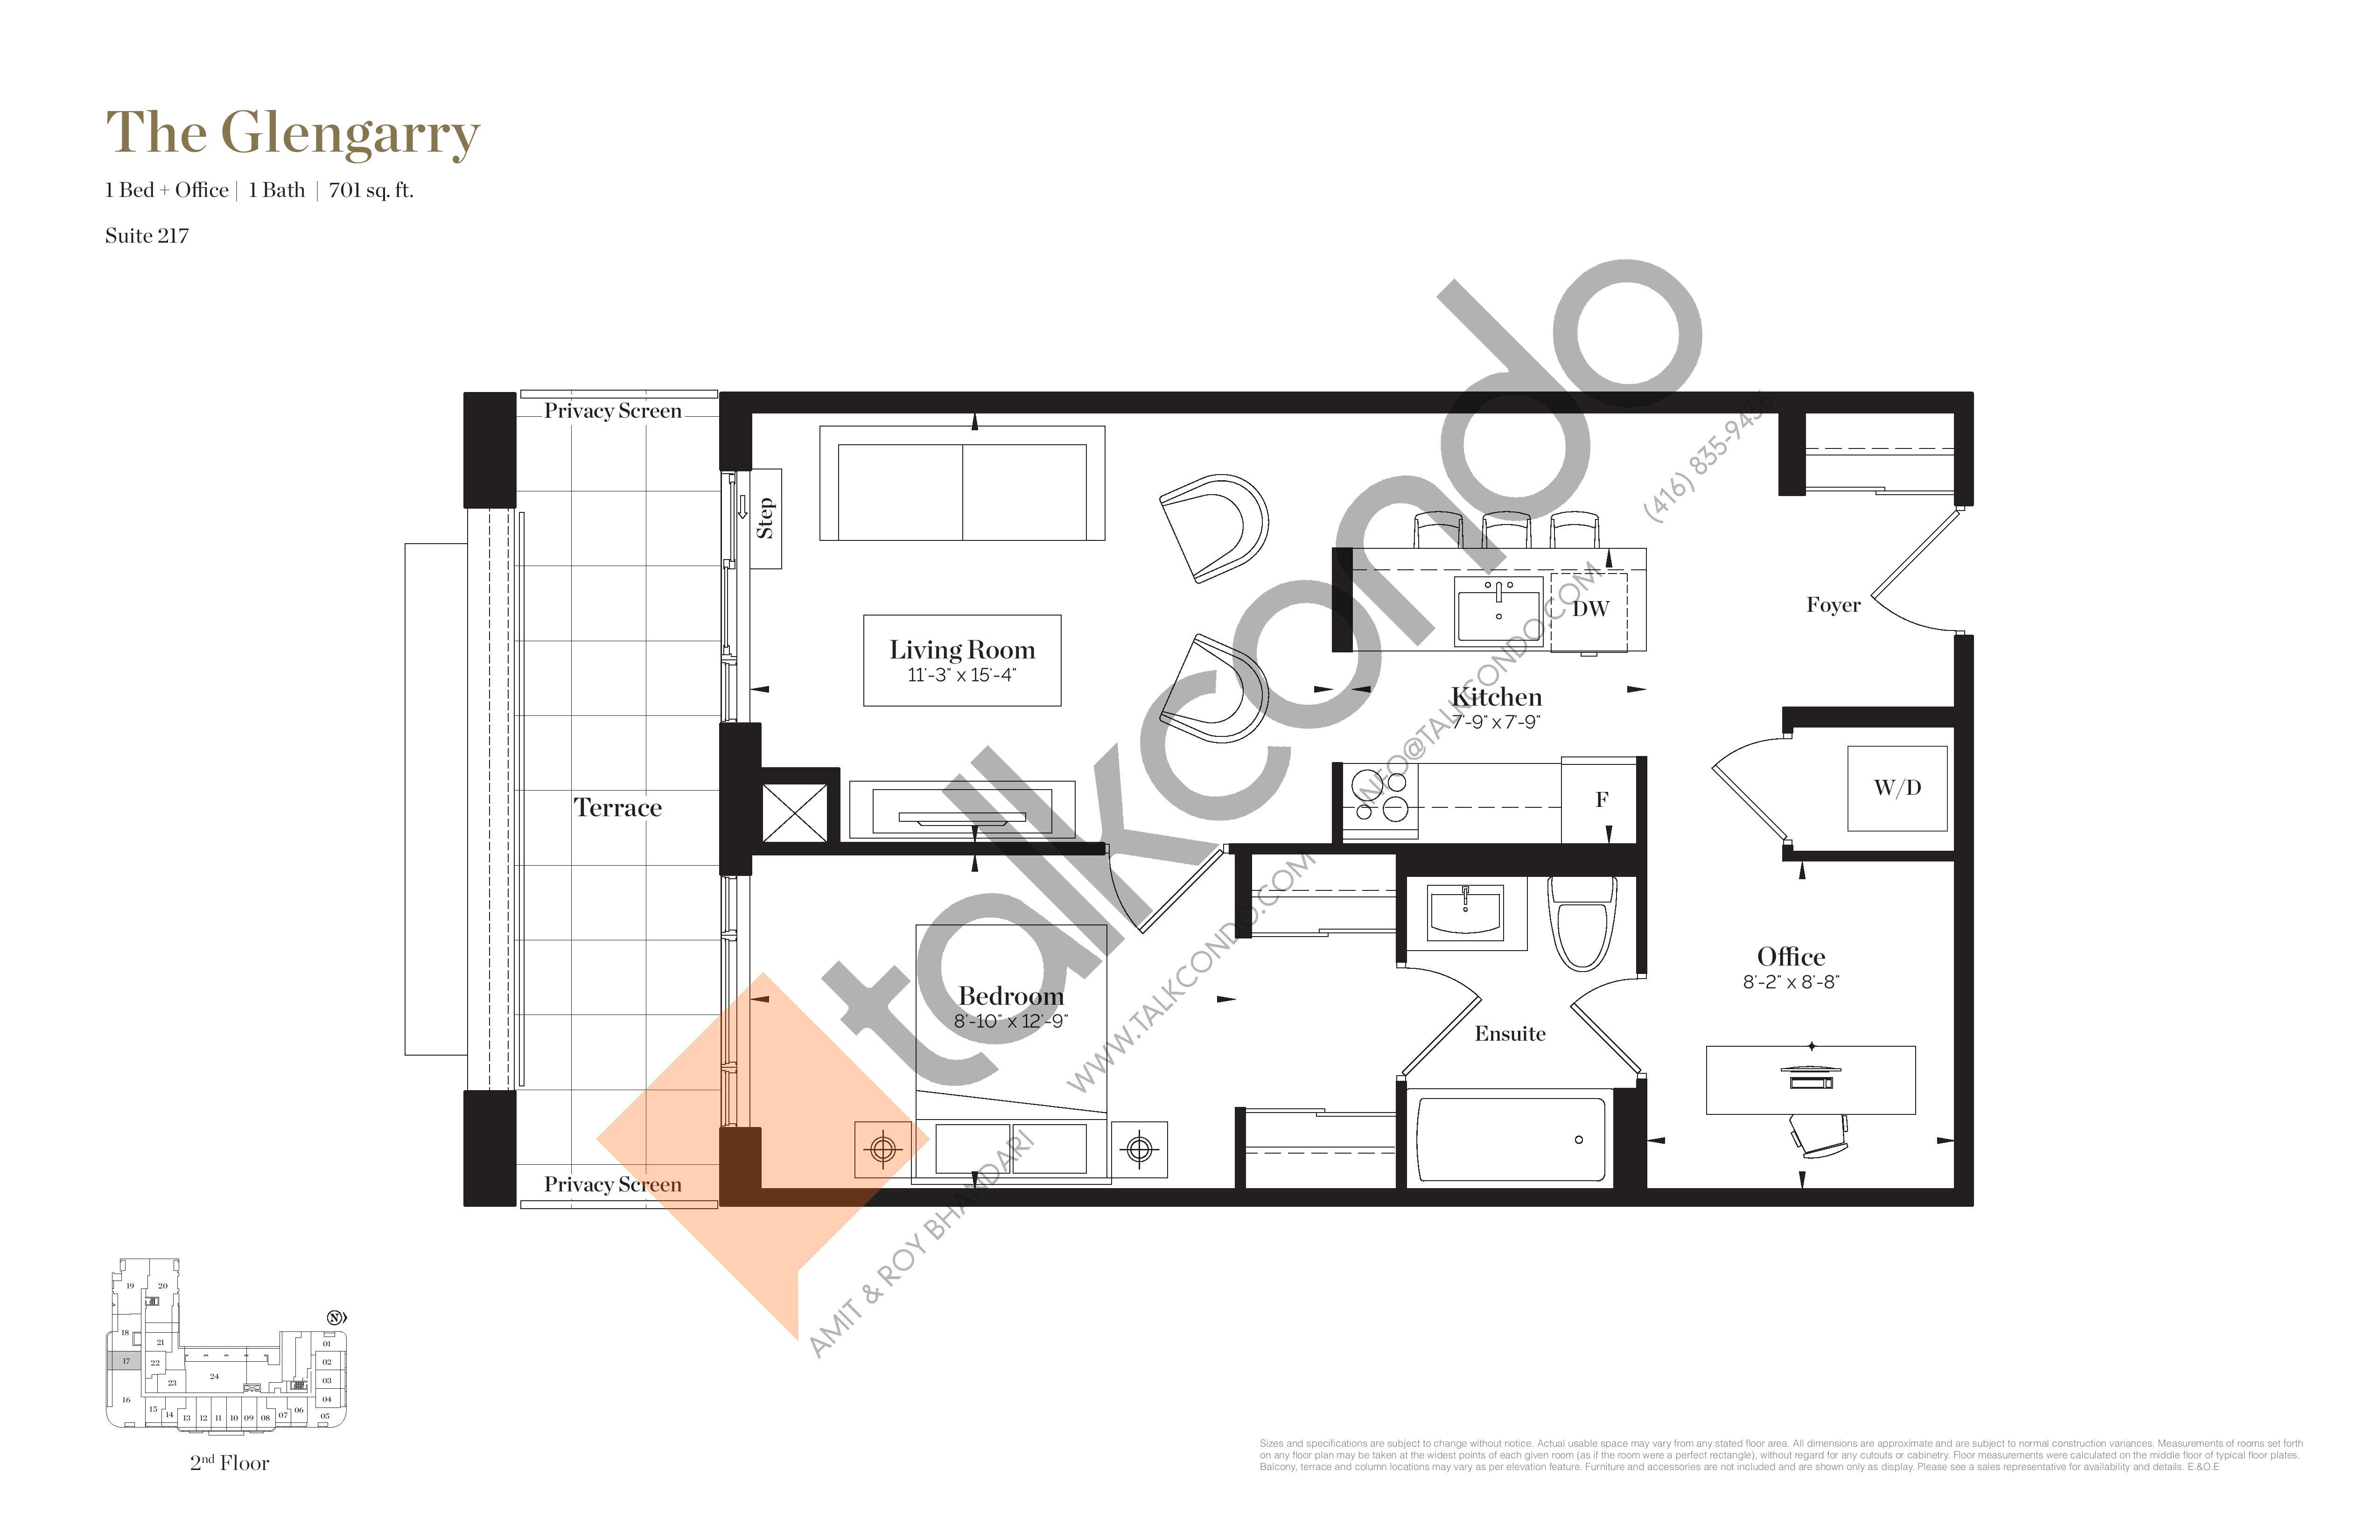 The Glengarry Floor Plan at Empire Maven Condos - 701 sq.ft